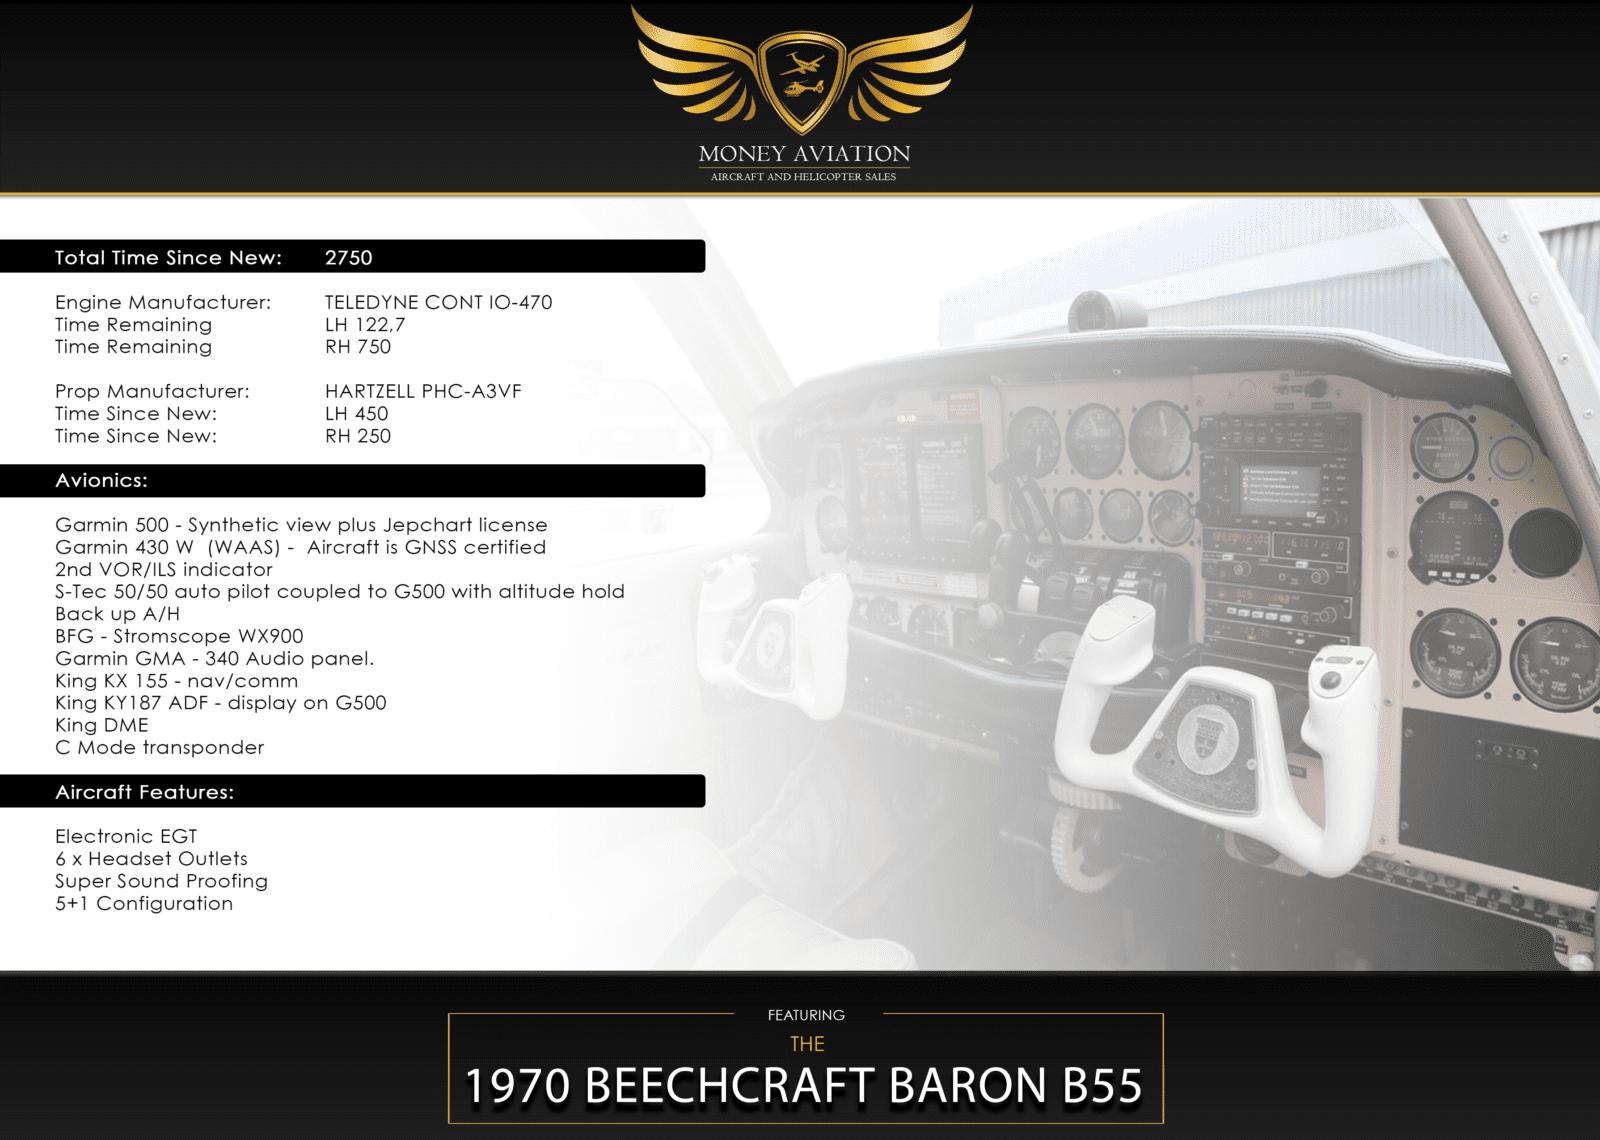 1970 BEECHCRAFT BARON B55 - Money Aviation